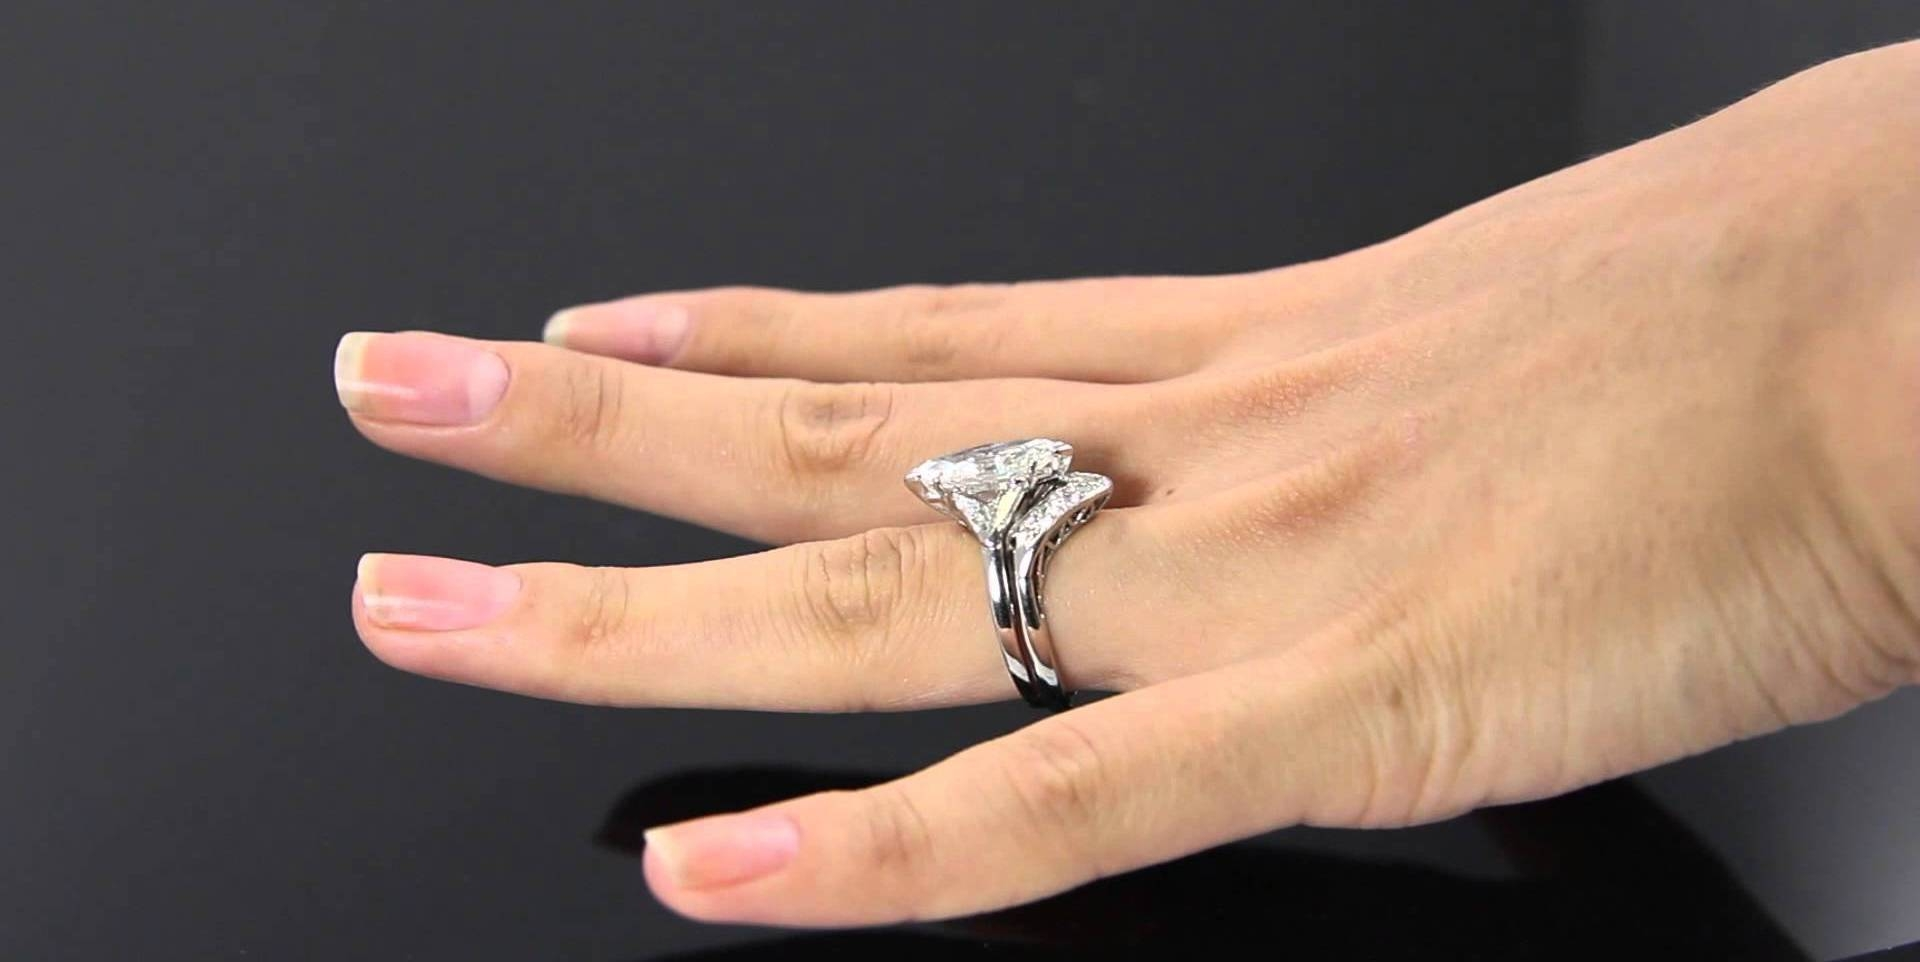 Ring Spinning Wedding Rings Stretch Wedding Ring Antique Wedding Throughout Stretchy Wedding Bands (View 8 of 15)